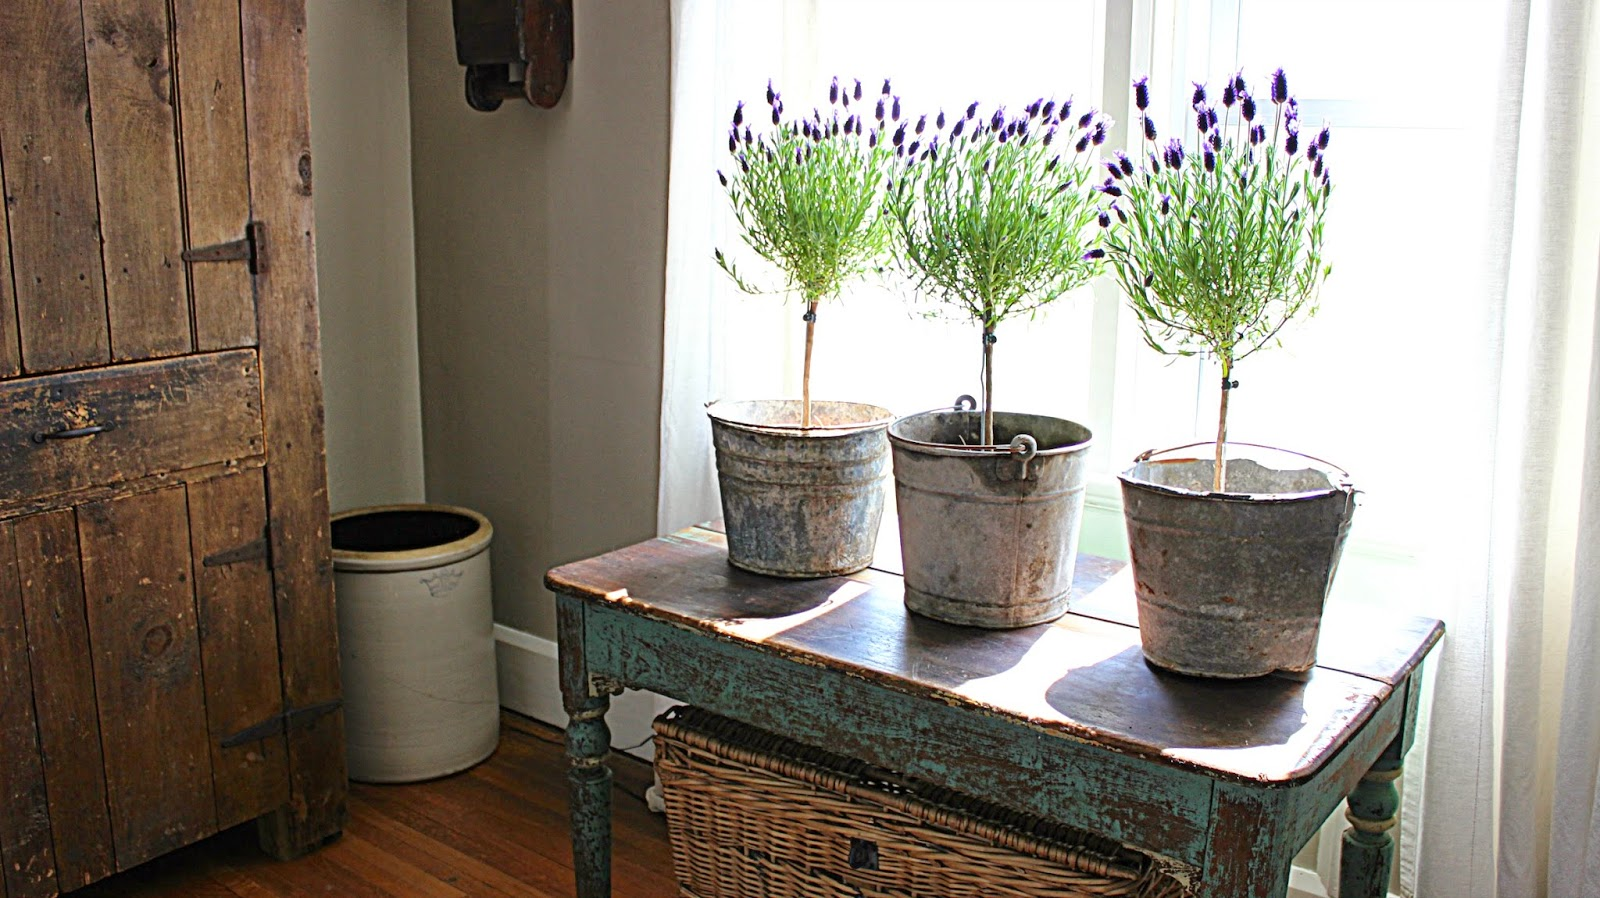 Thursday 8 May 2014 Rustic Farmhouse Lavender